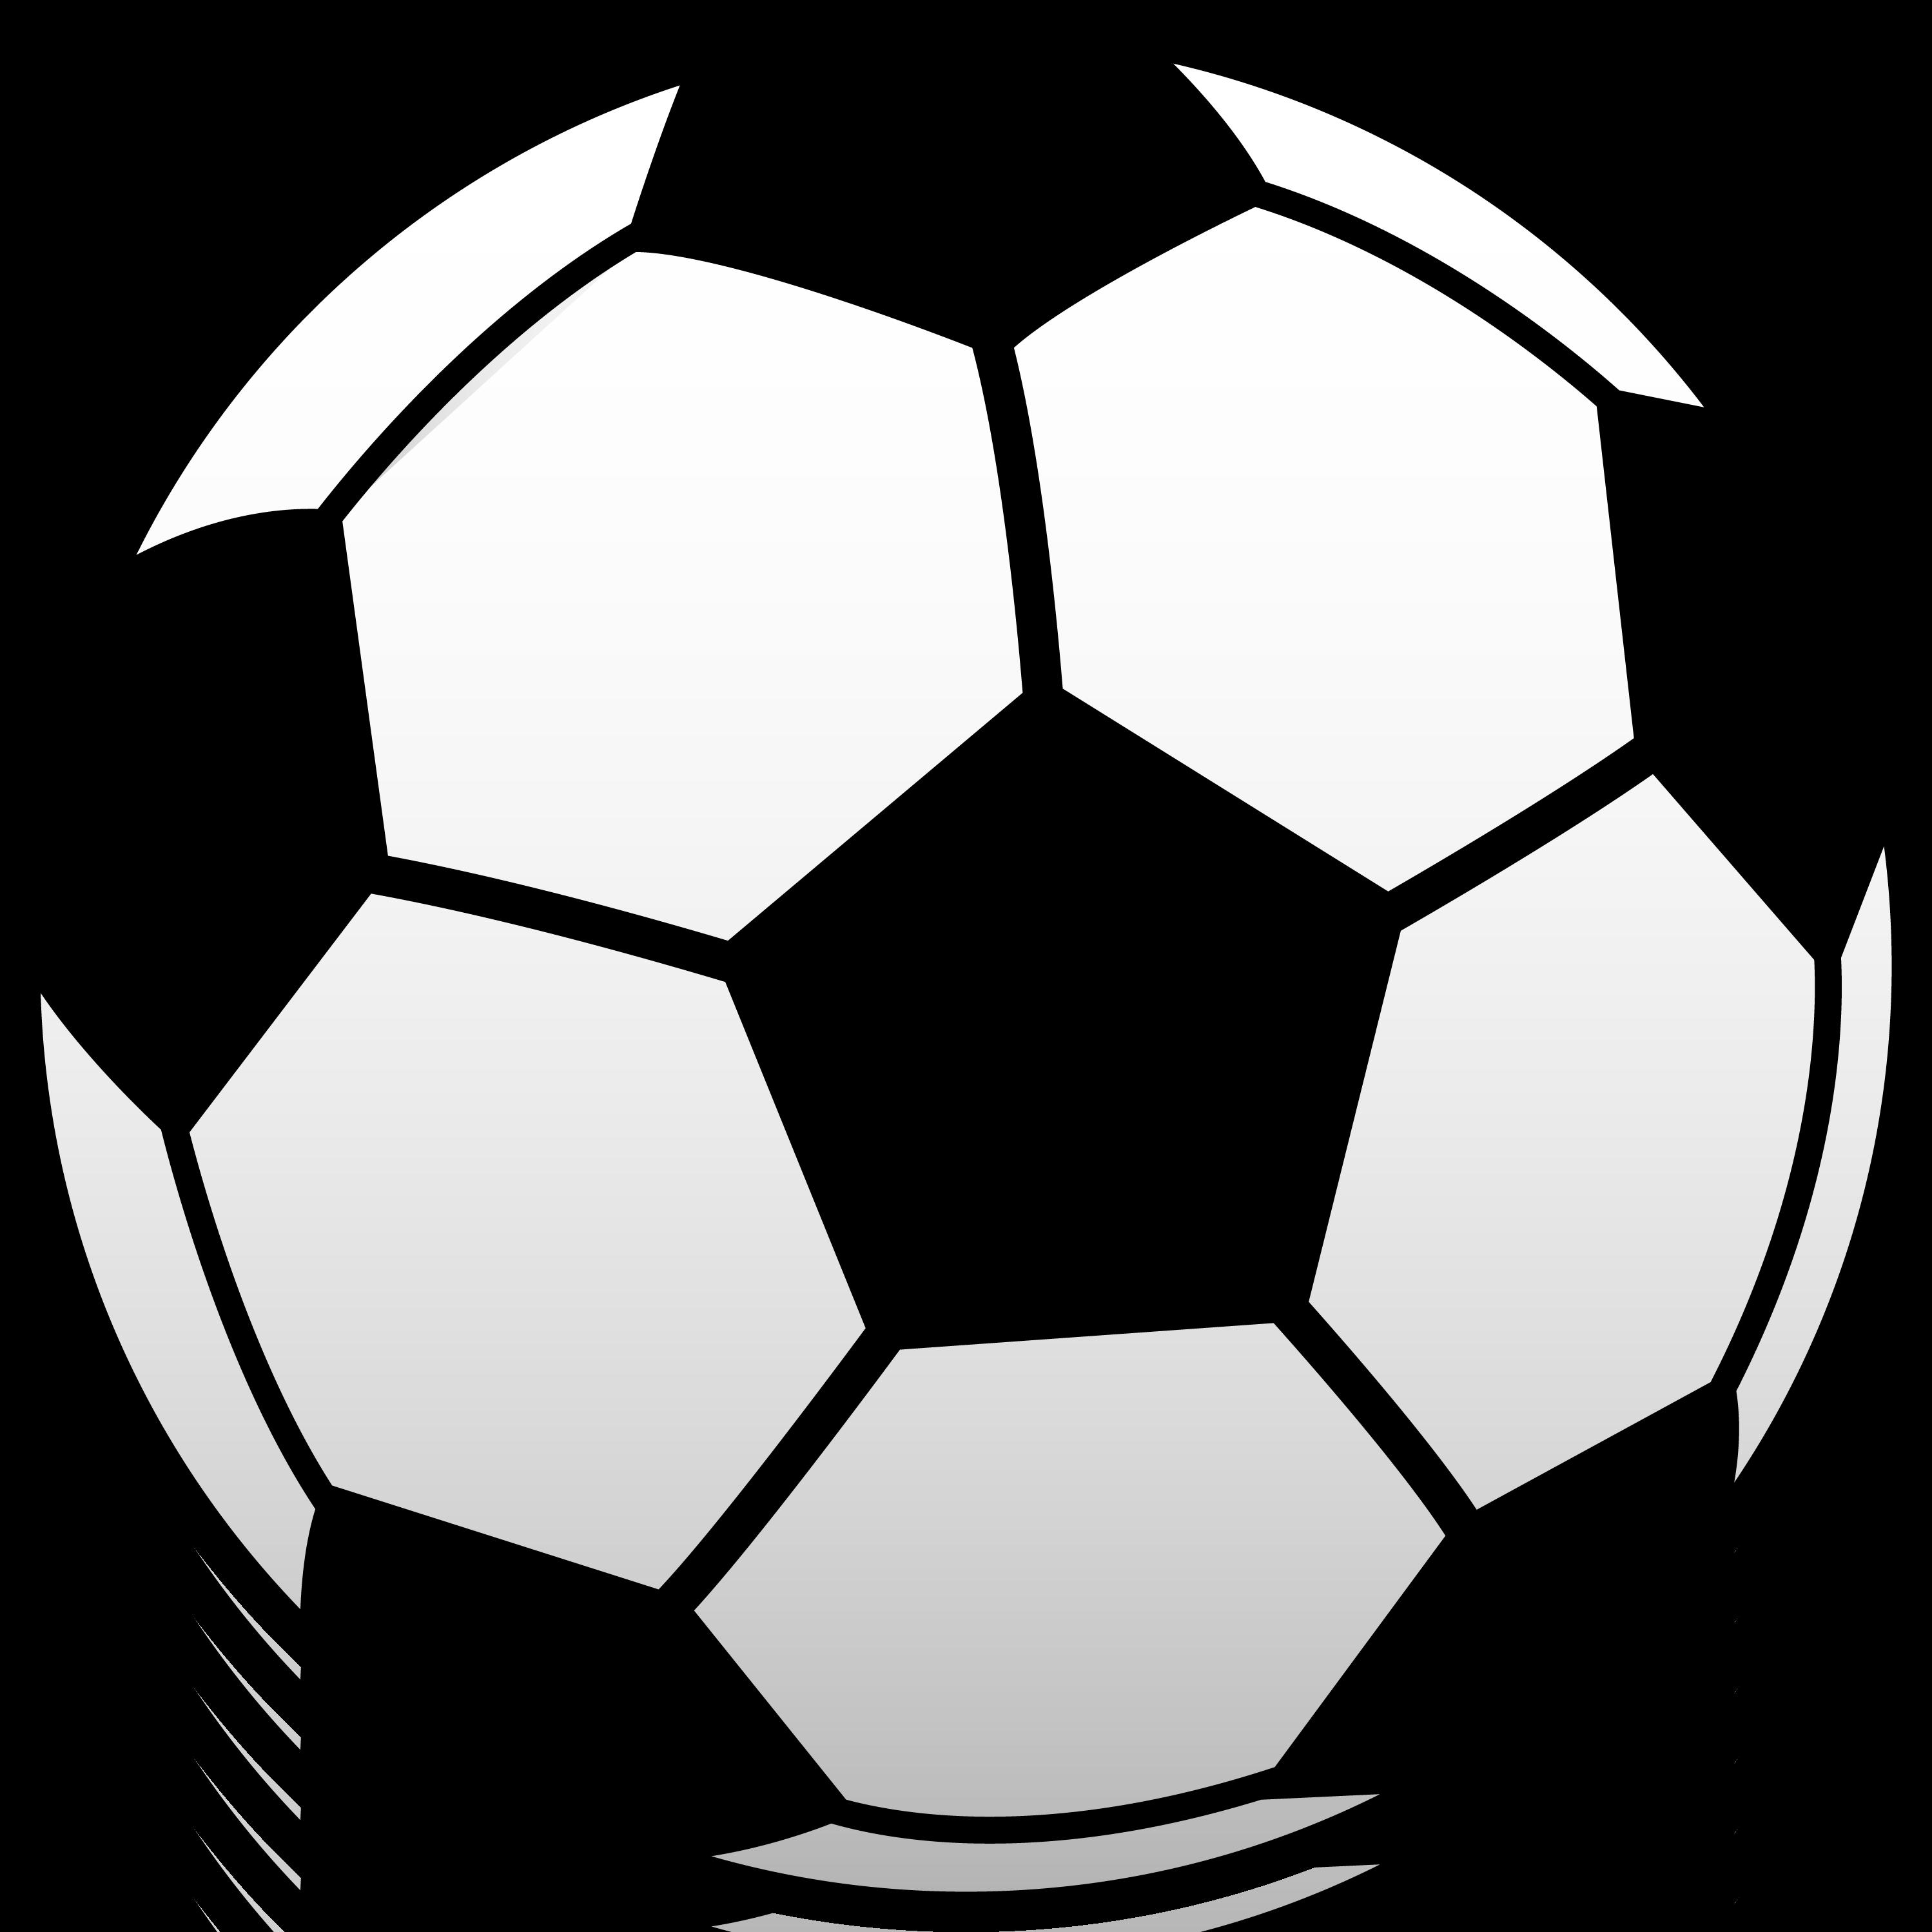 Football clip art football clipart photo niceclipart 3 3